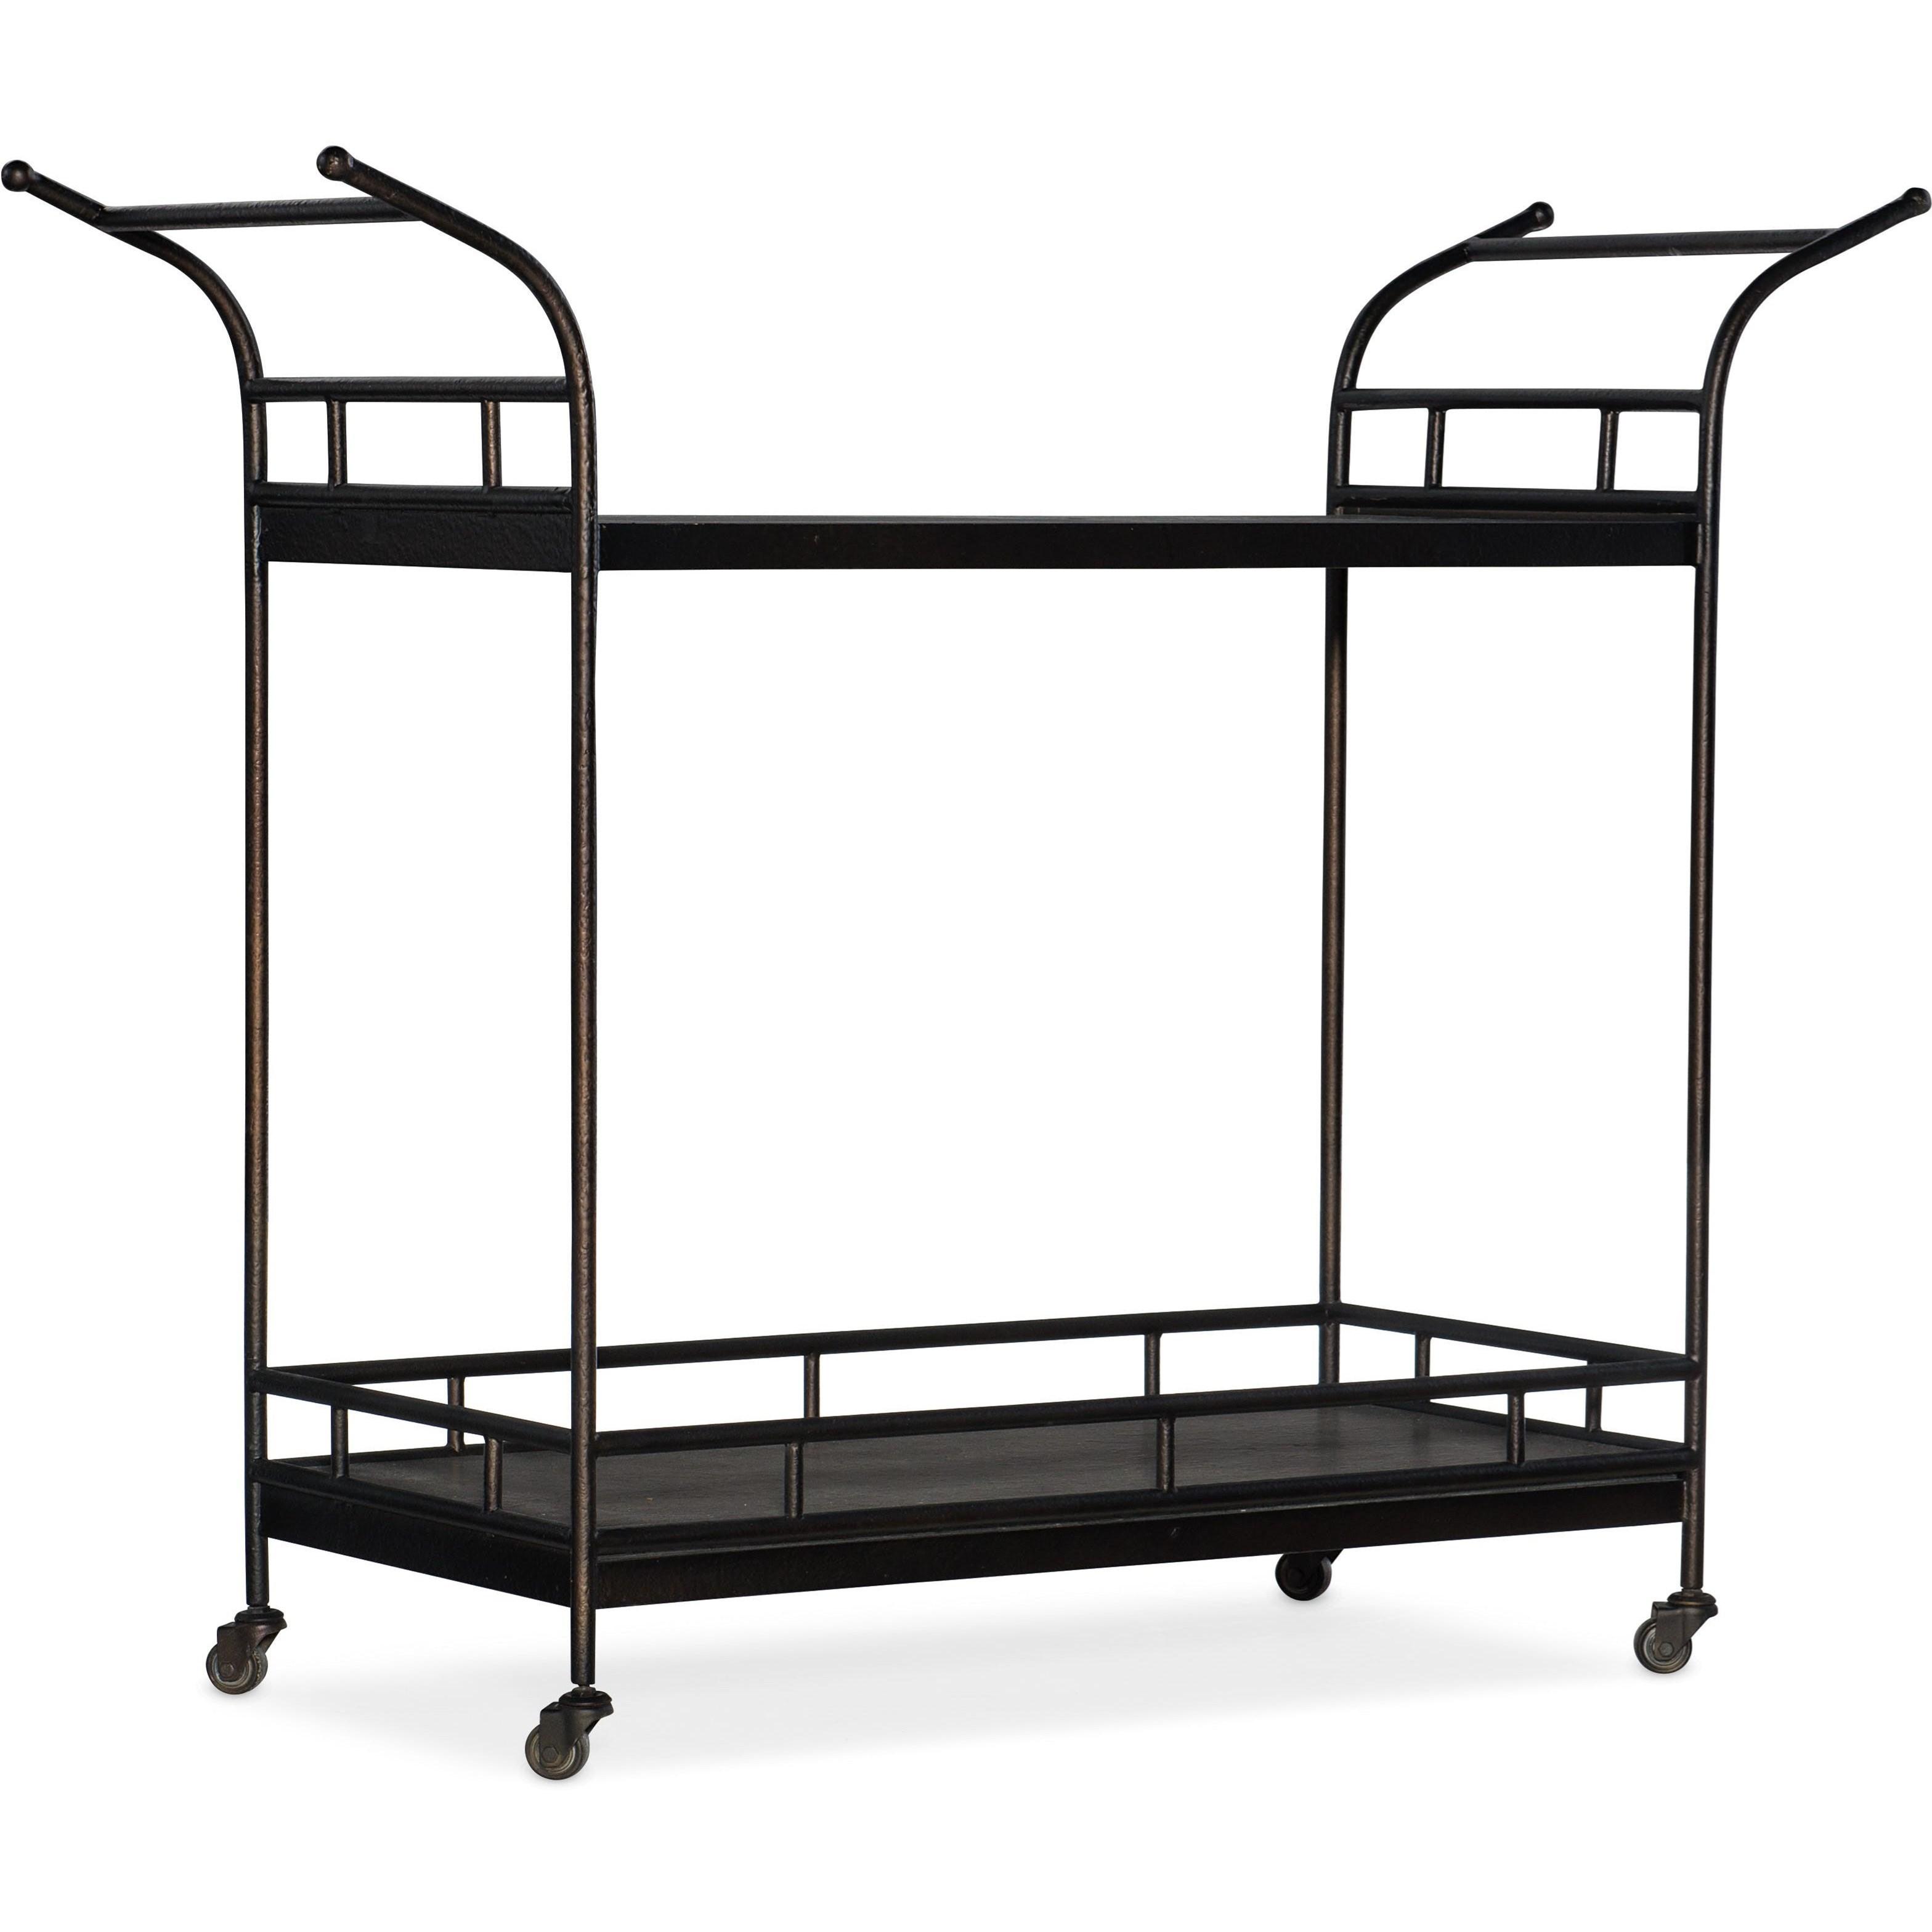 Ciao Bella Bar Cart by Hooker Furniture at Baer's Furniture